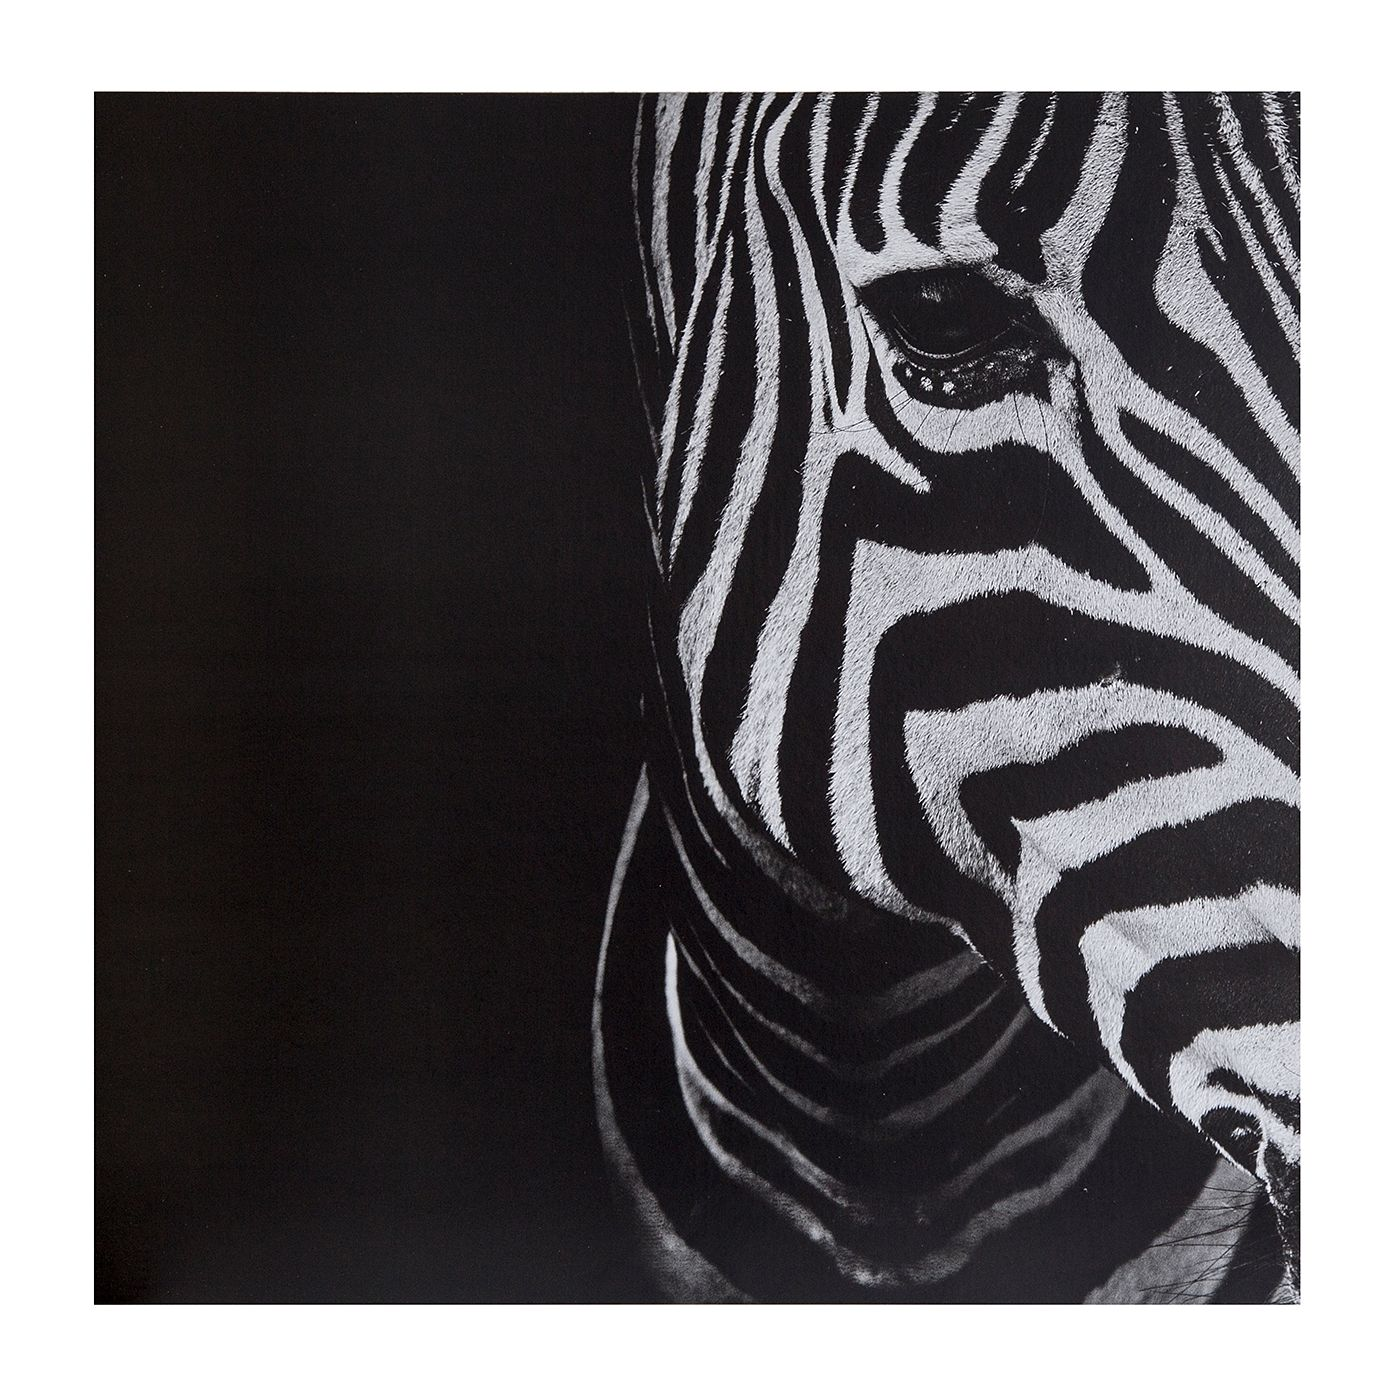 Deko-Panel Adora Zebra kaufen   home24